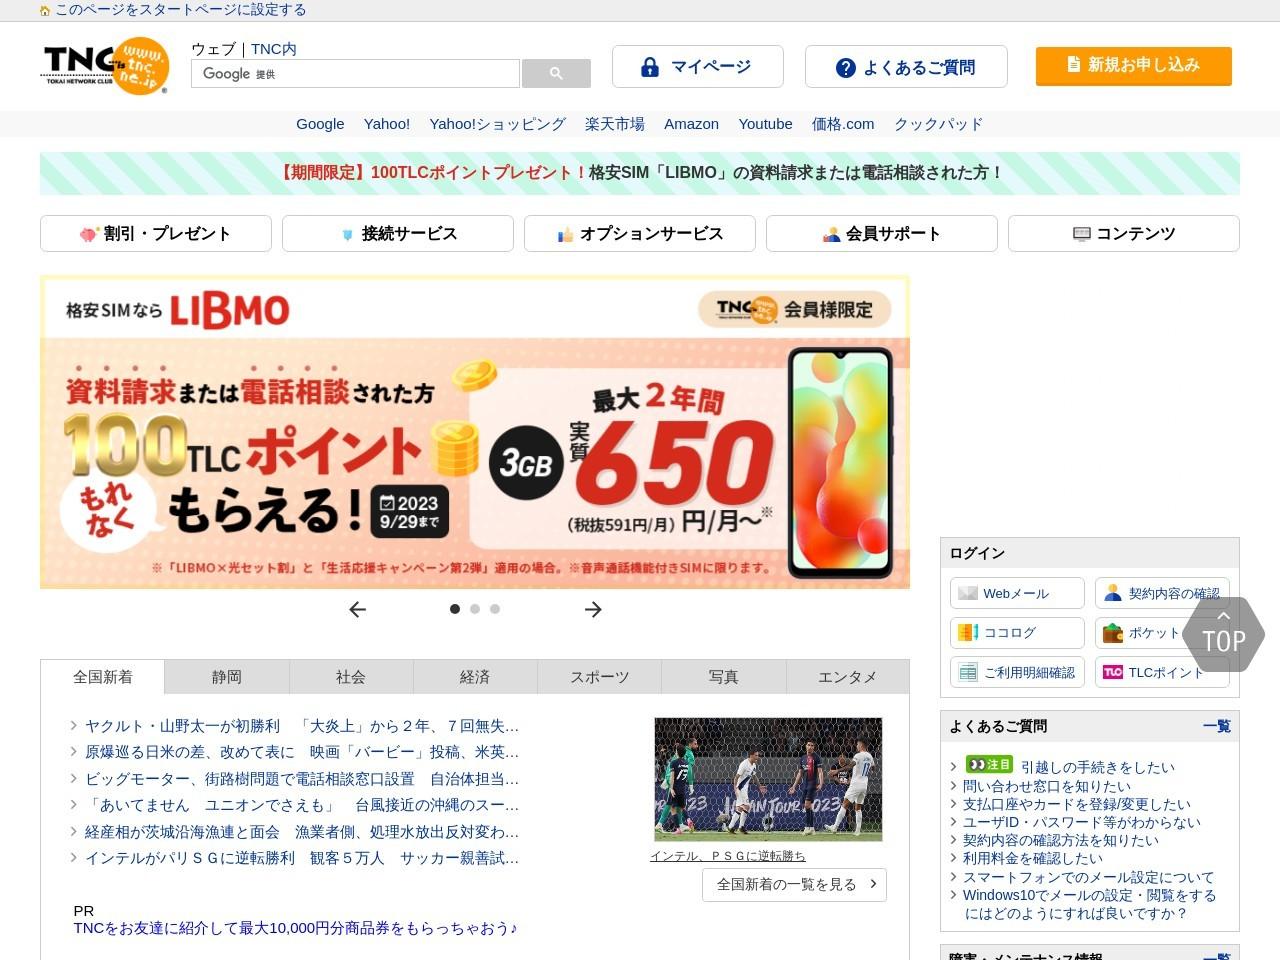 TOKAIネットワーククラブ(TNC)